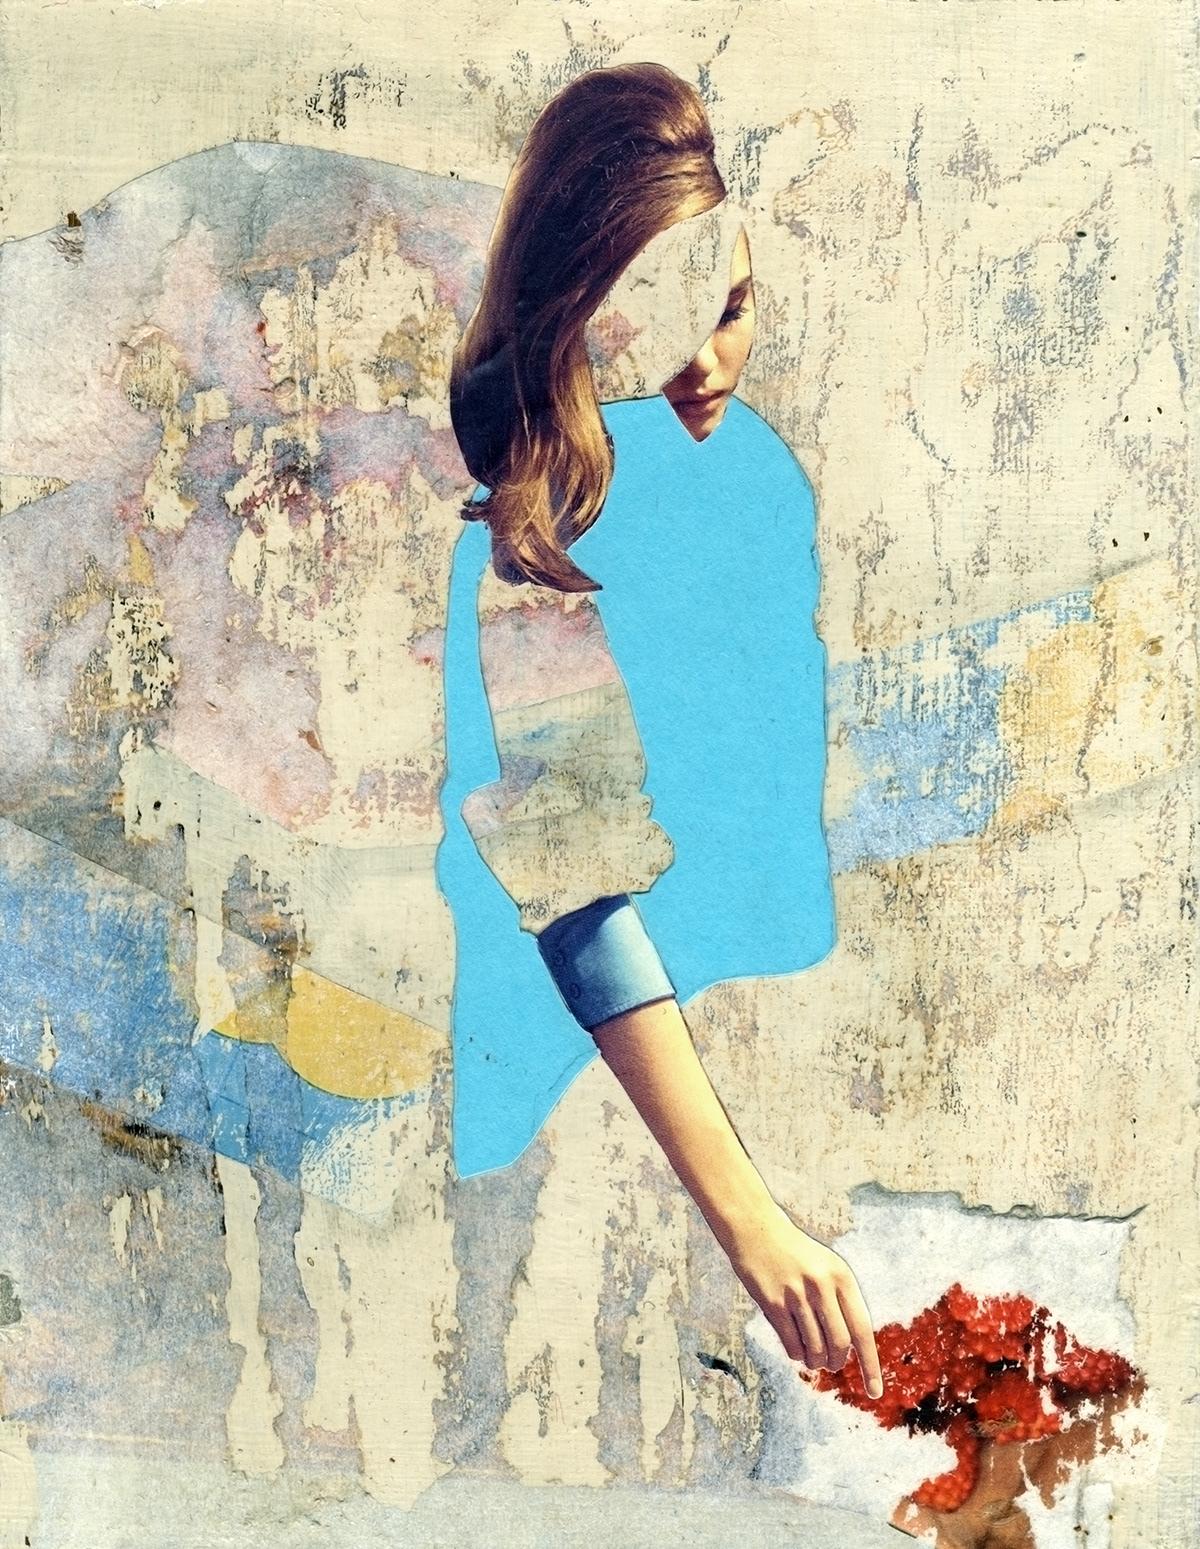 collage acrylics